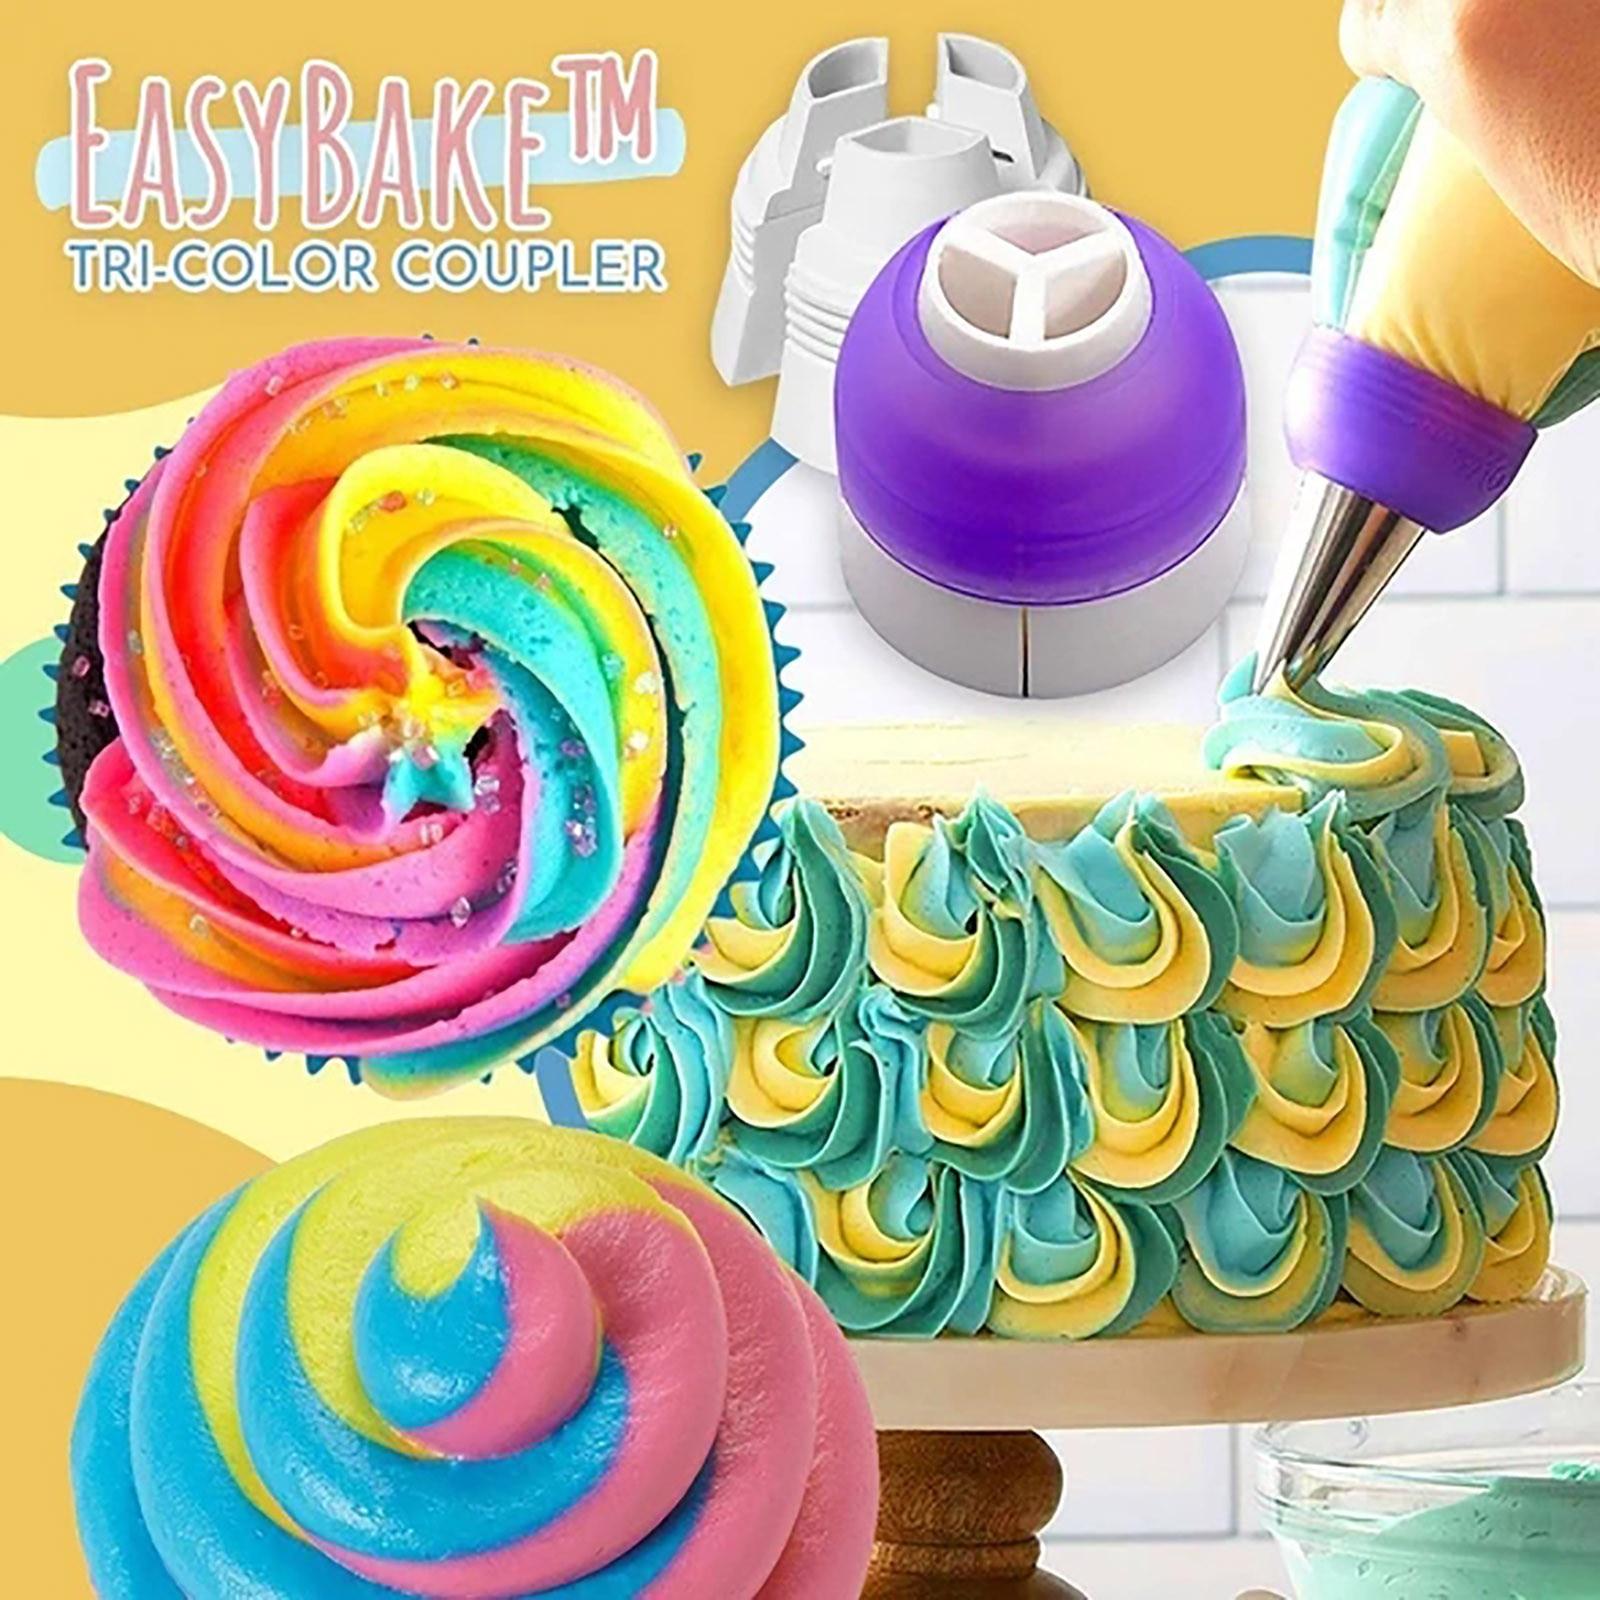 Convertidor de boquillas para bolsa de manga pastelera acoplador de crema tricolor adaptador de boquillas de pastelería